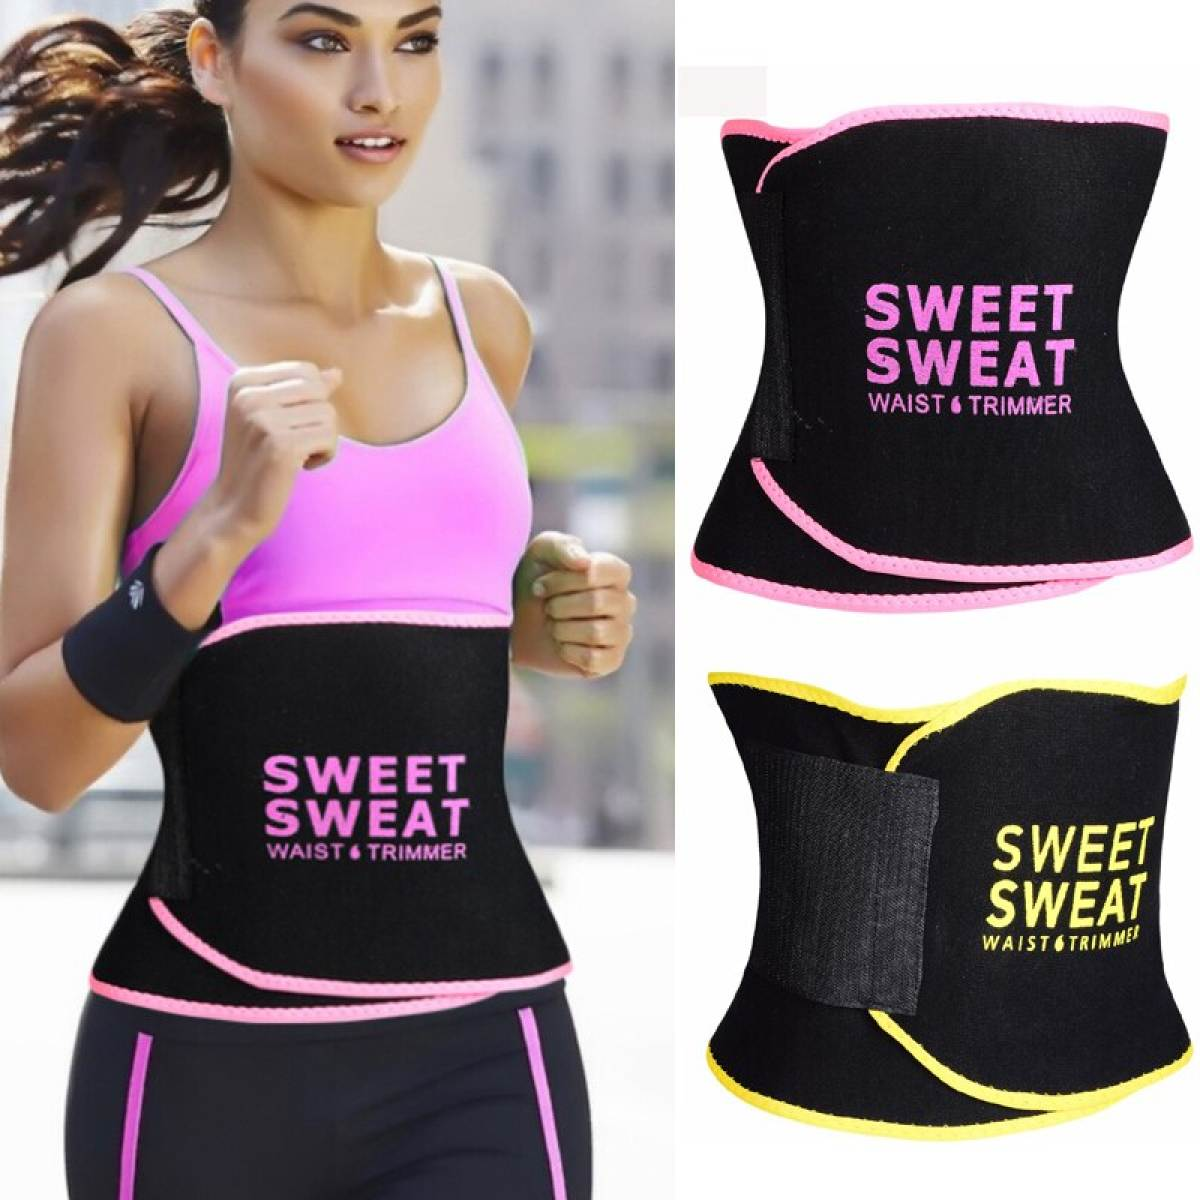 Super Duper Store Best Quality Waist Trimmer Sweat Belt Weight Loss Waist Trainer Slimming Belt for Men and Women Fat Burner Low Back Support Shaper - Black